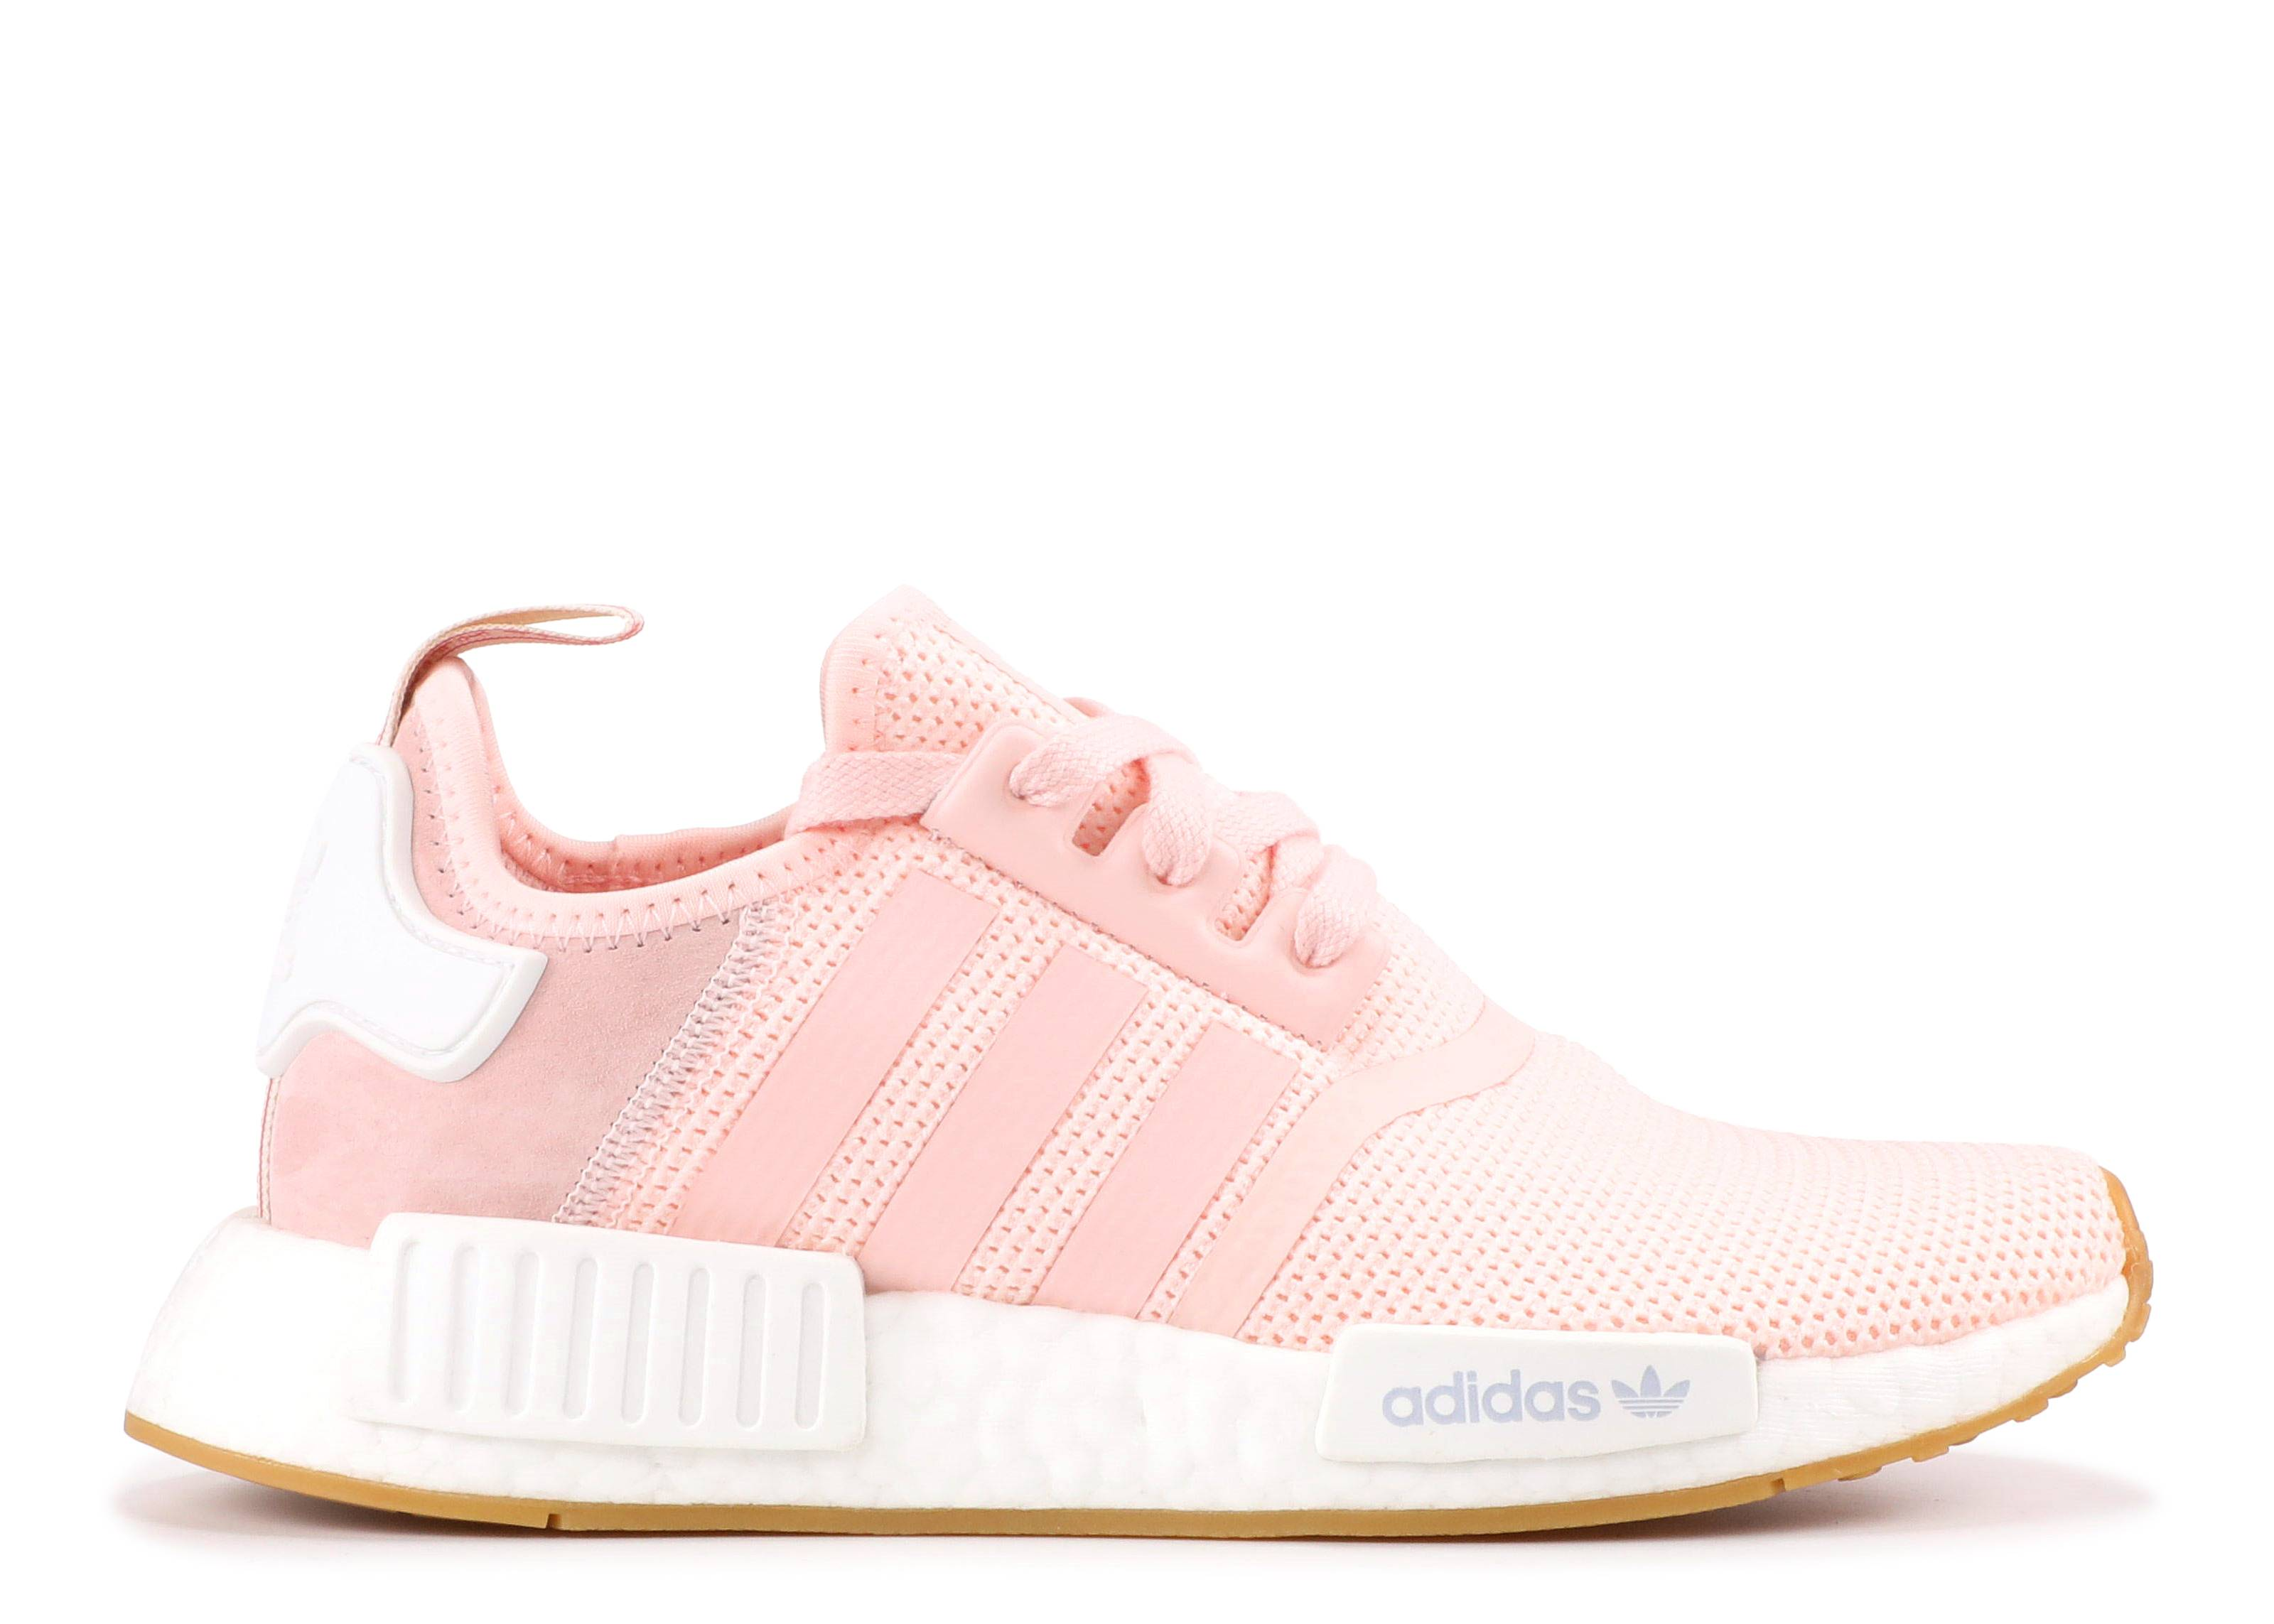 adidas NMD R1 Pink White | G27687